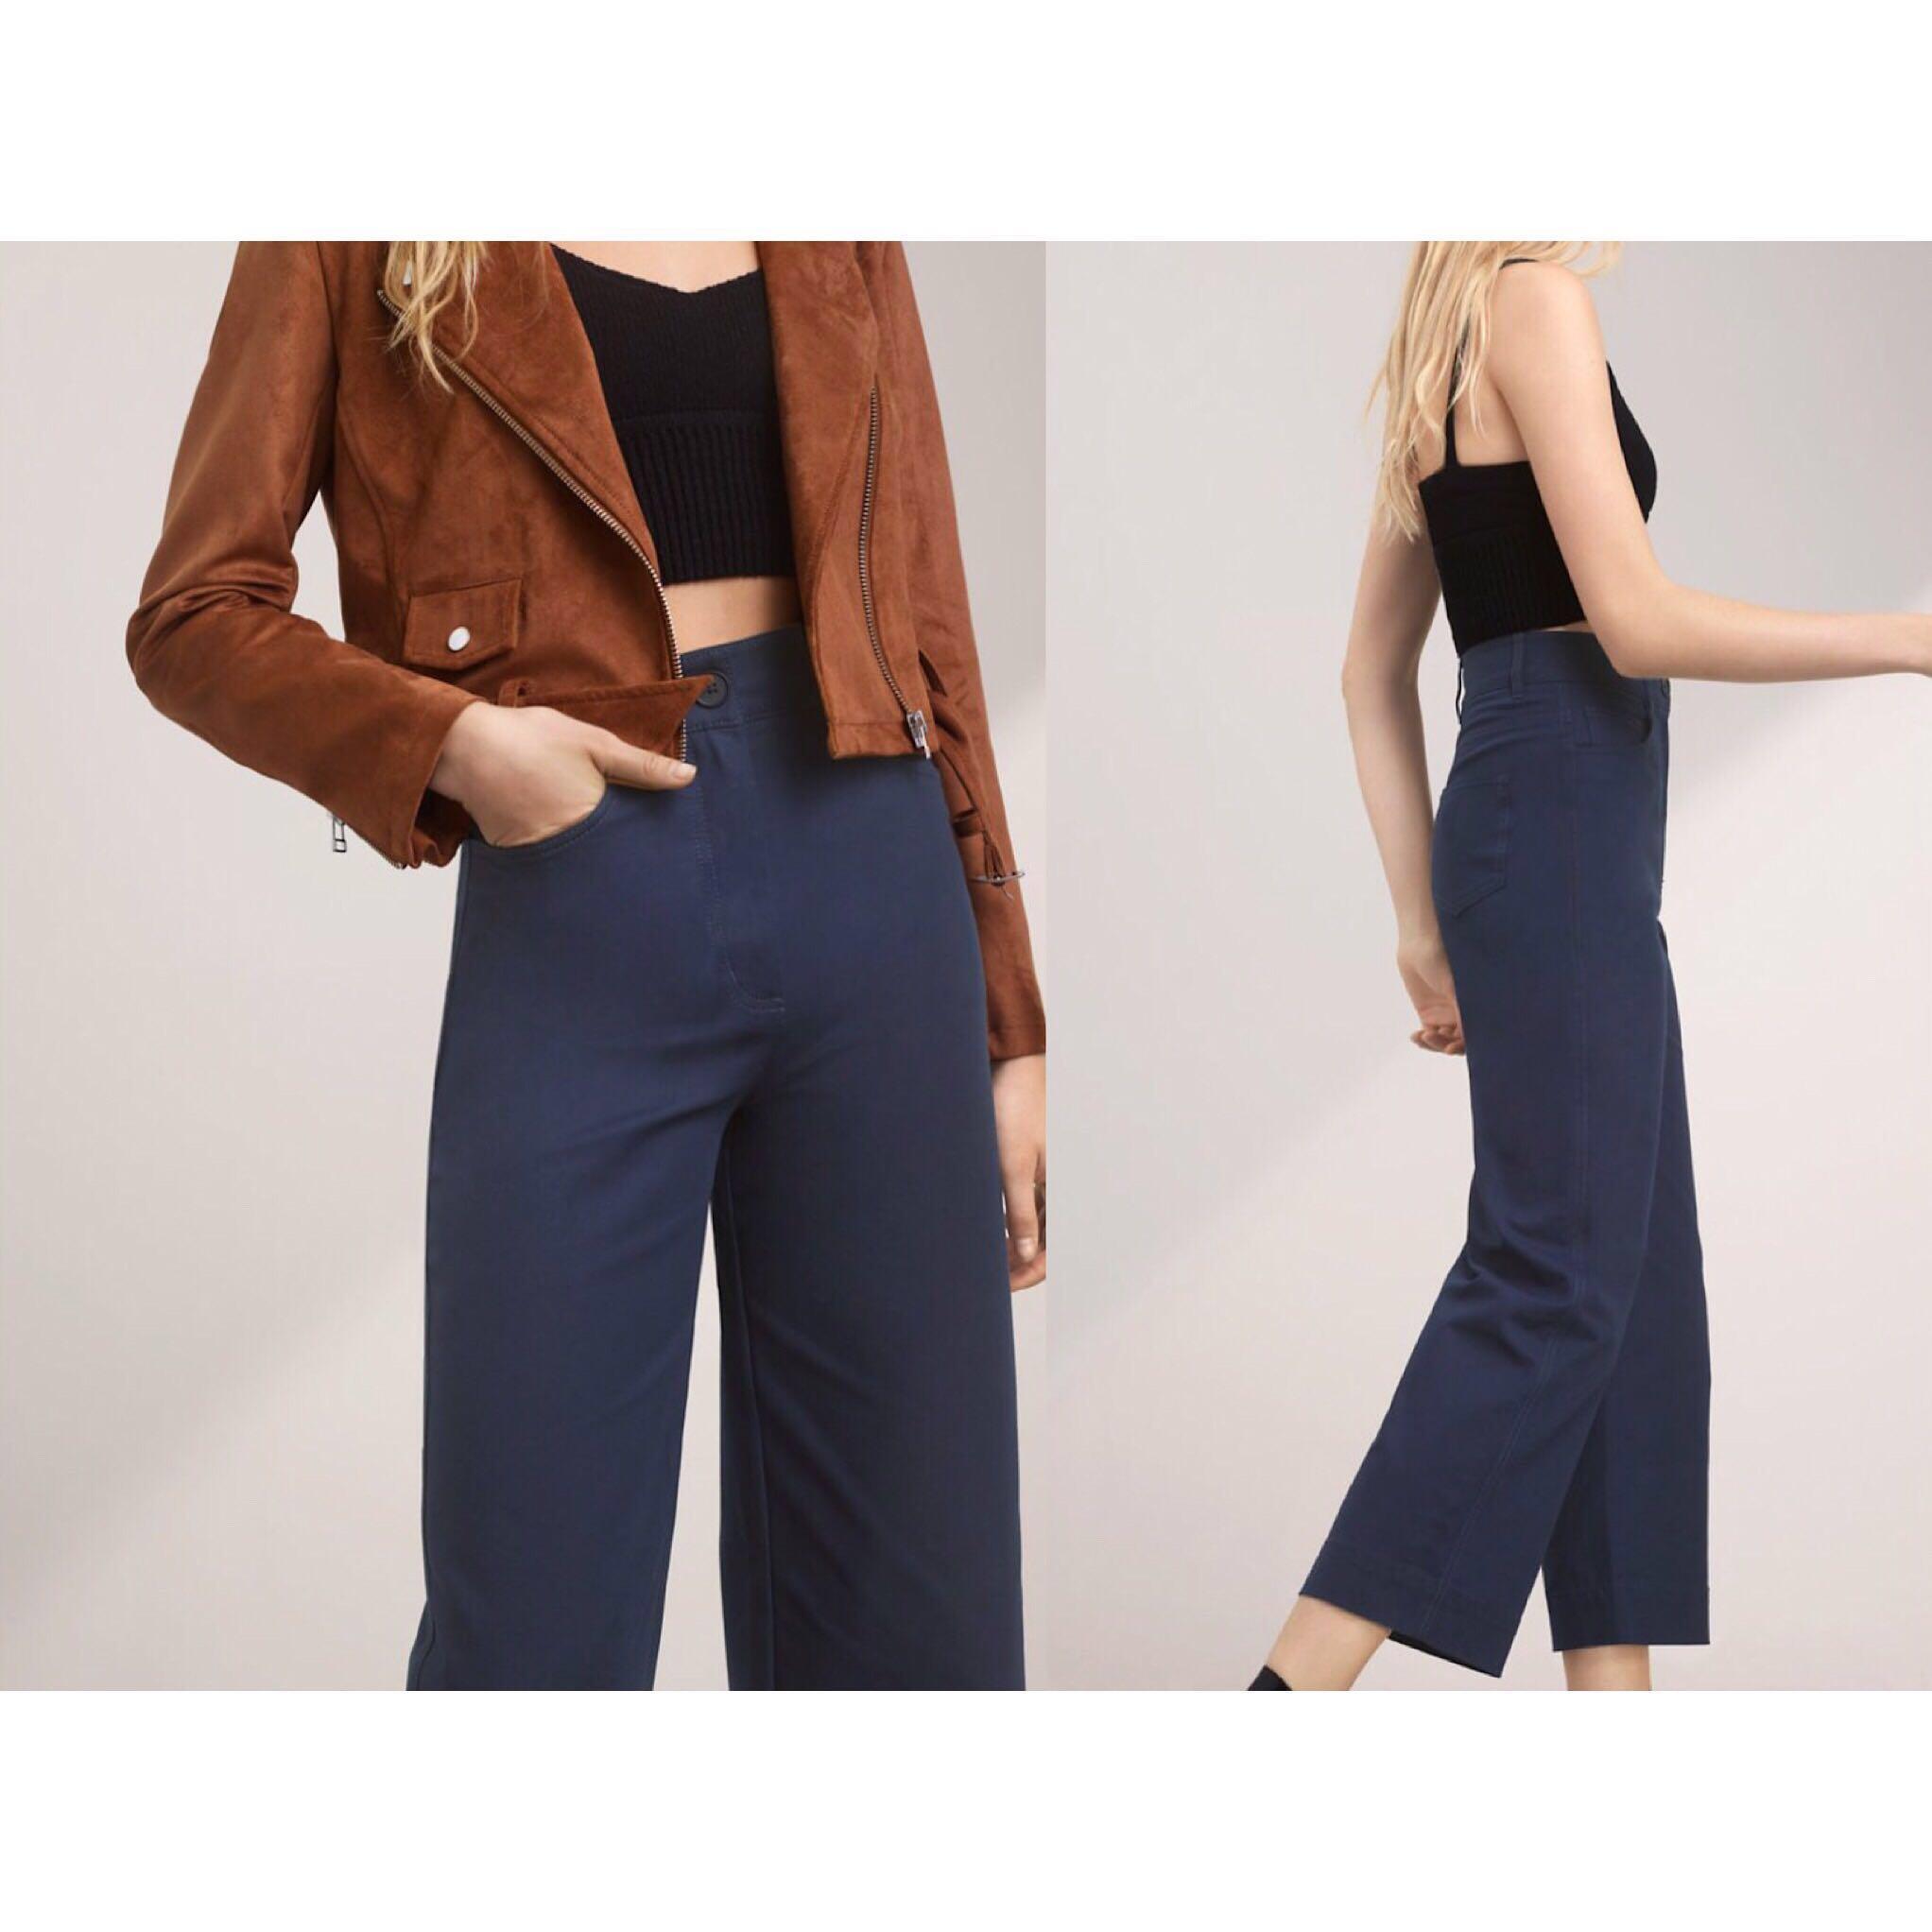 *NWT✨* Aritzia / Talula Slindon Pants Women Size 2